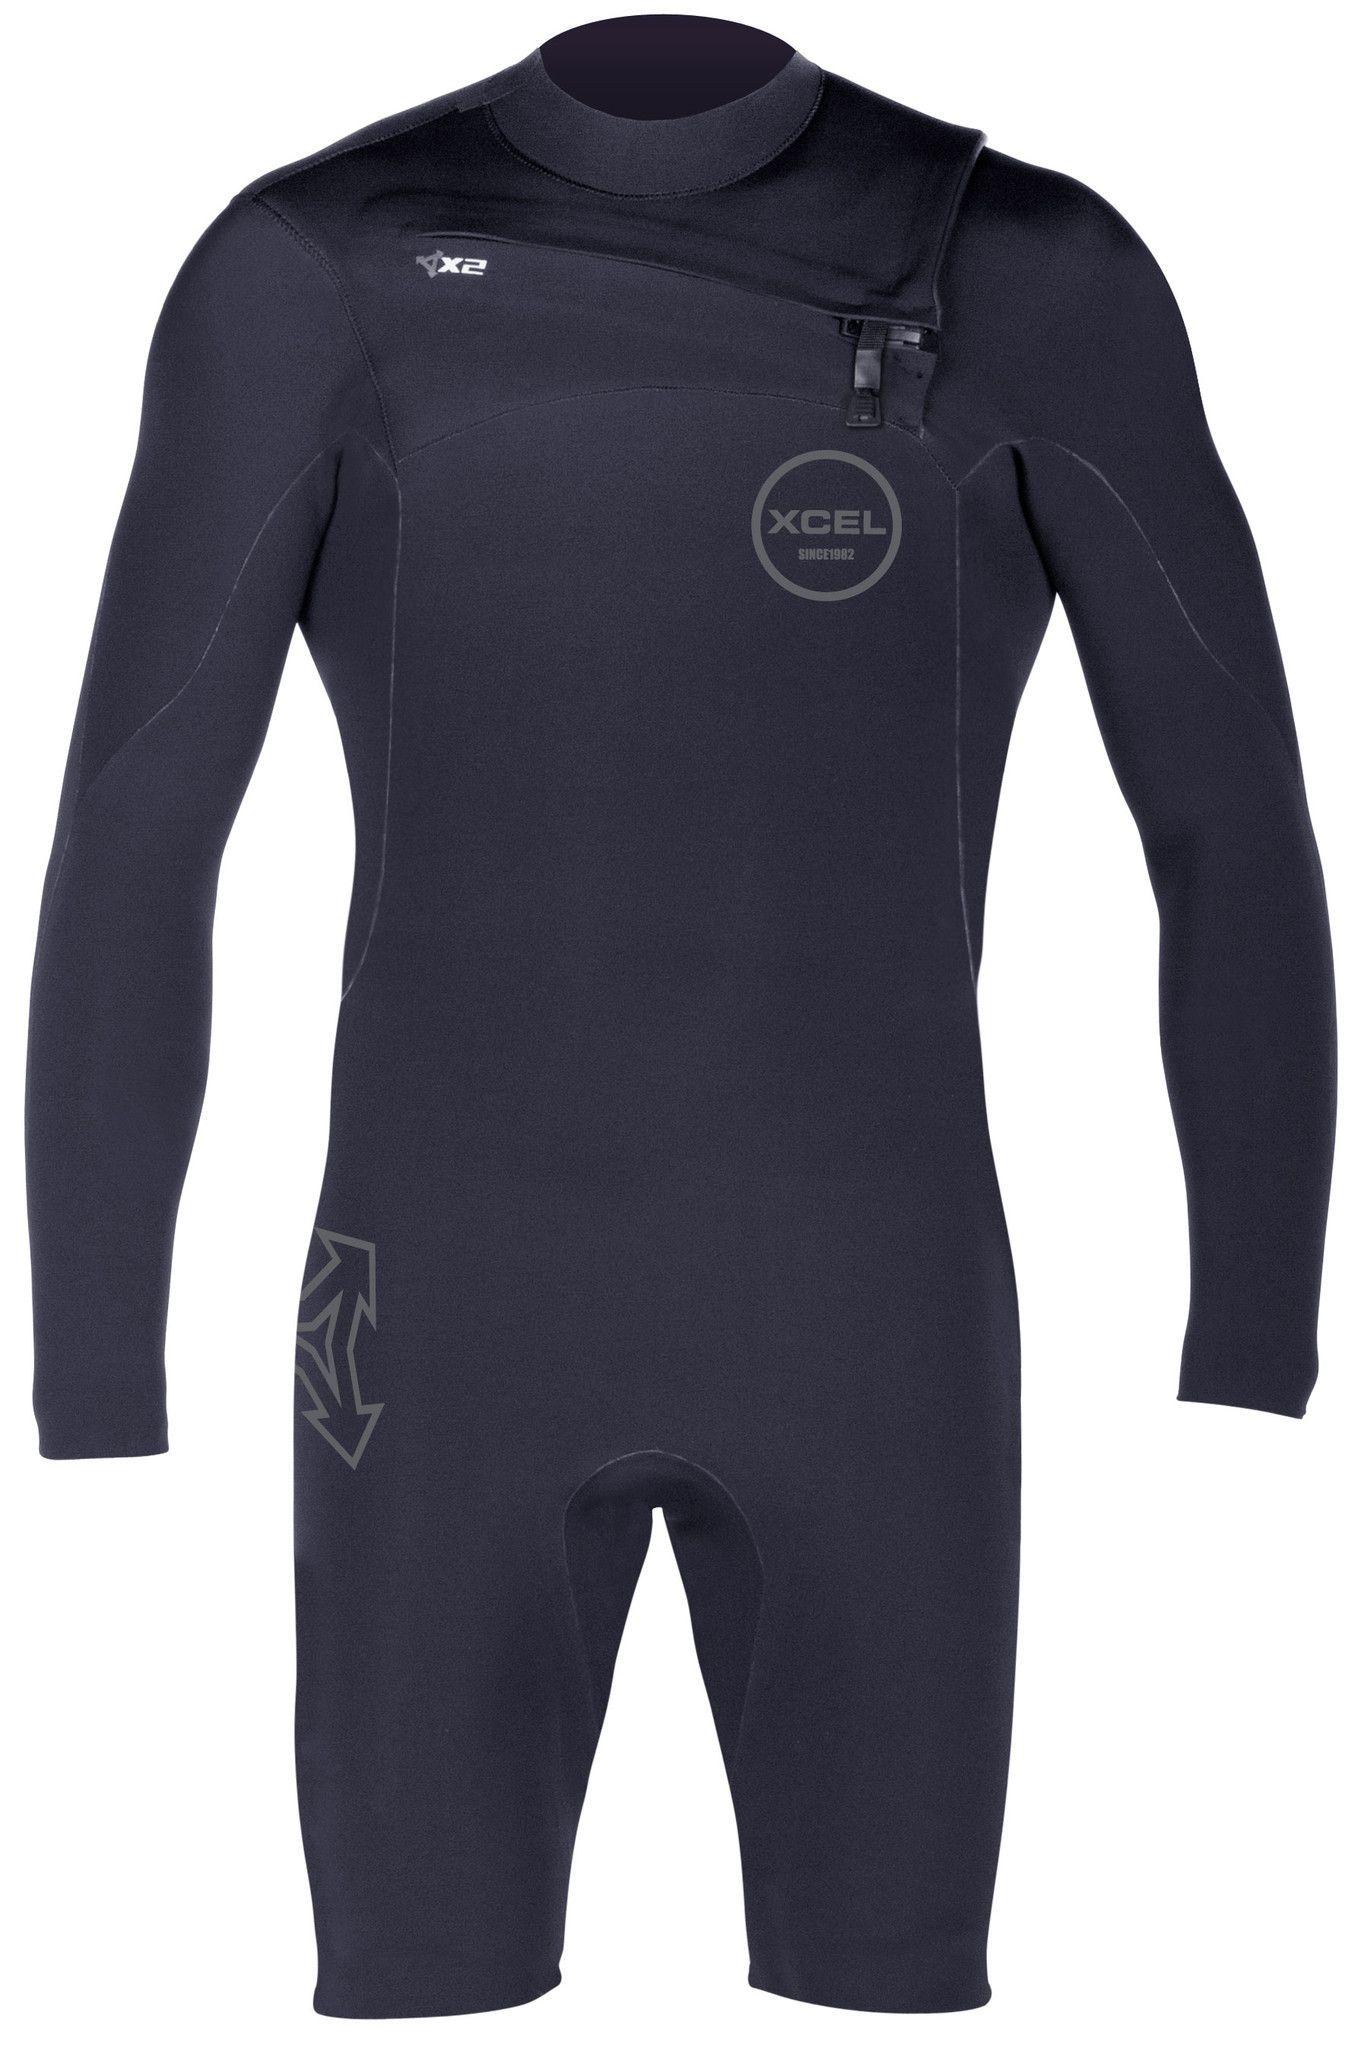 bede63c5f0 Xcel Mens Wetsuit Infiniti Comp Long Sleeve Springsuit